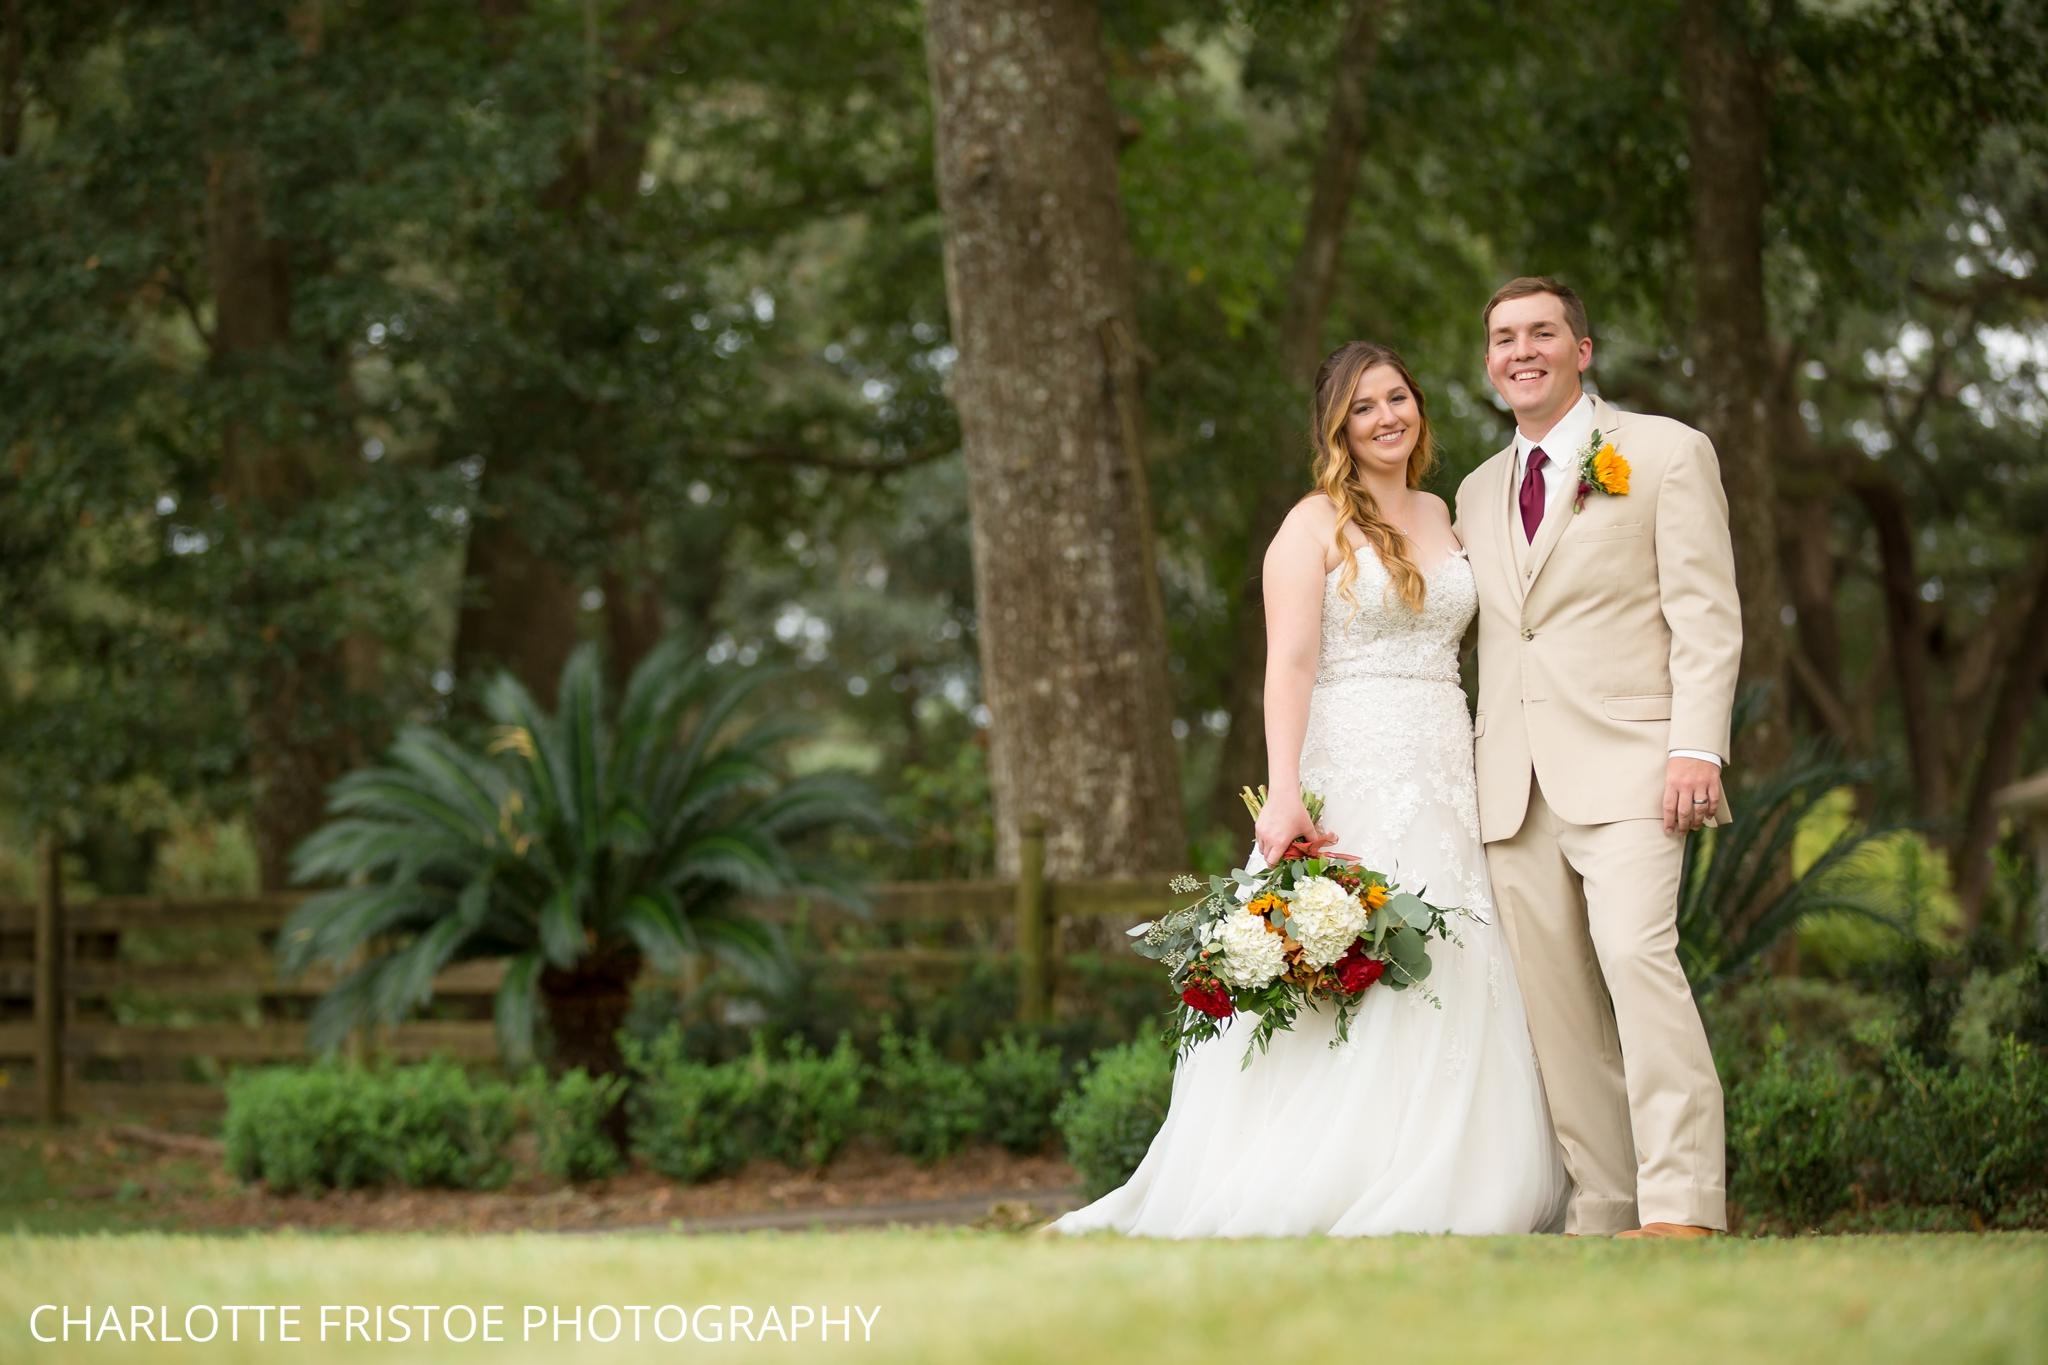 Tallahassee_Wedding_Charlotte_Fristoe-58.jpg